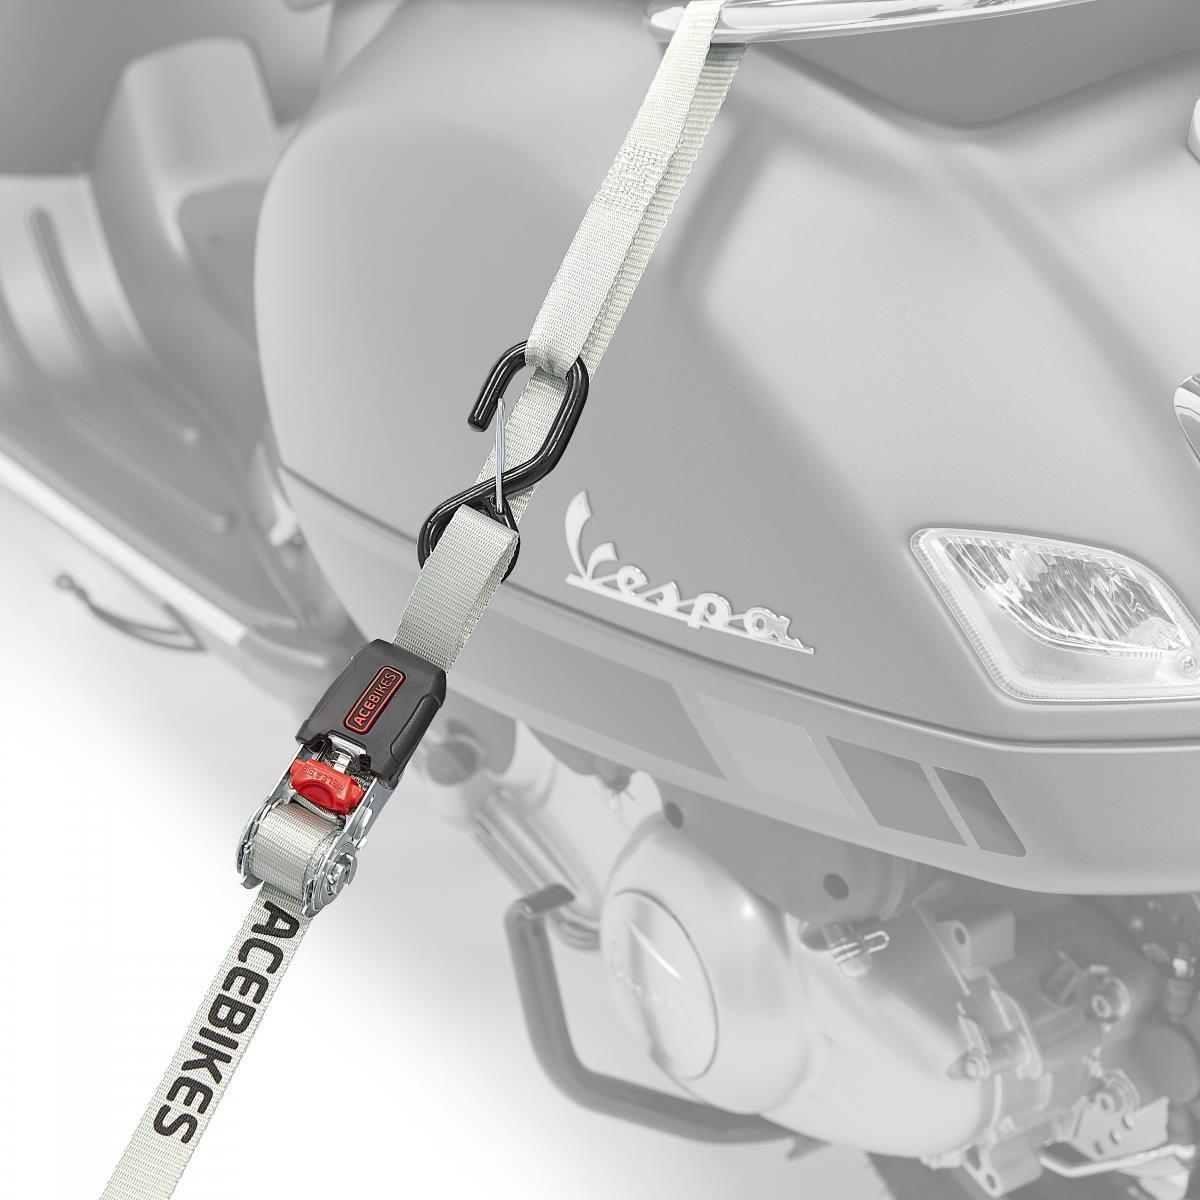 Acebikes Tie Down met spanband Scooter